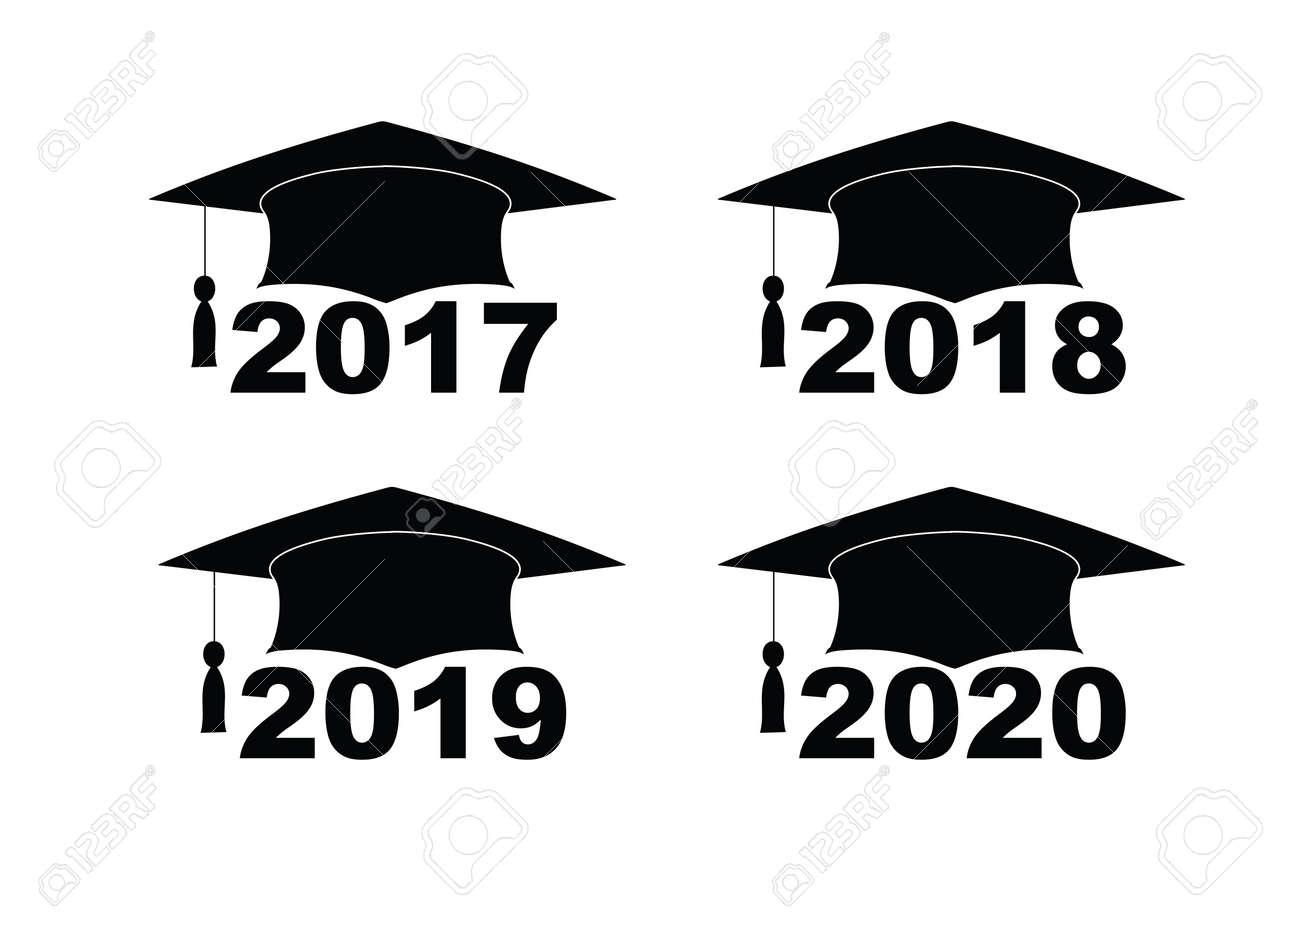 Graduation Hat 2020.Text With Graduation Hat Set On A White Set Sign Illustration